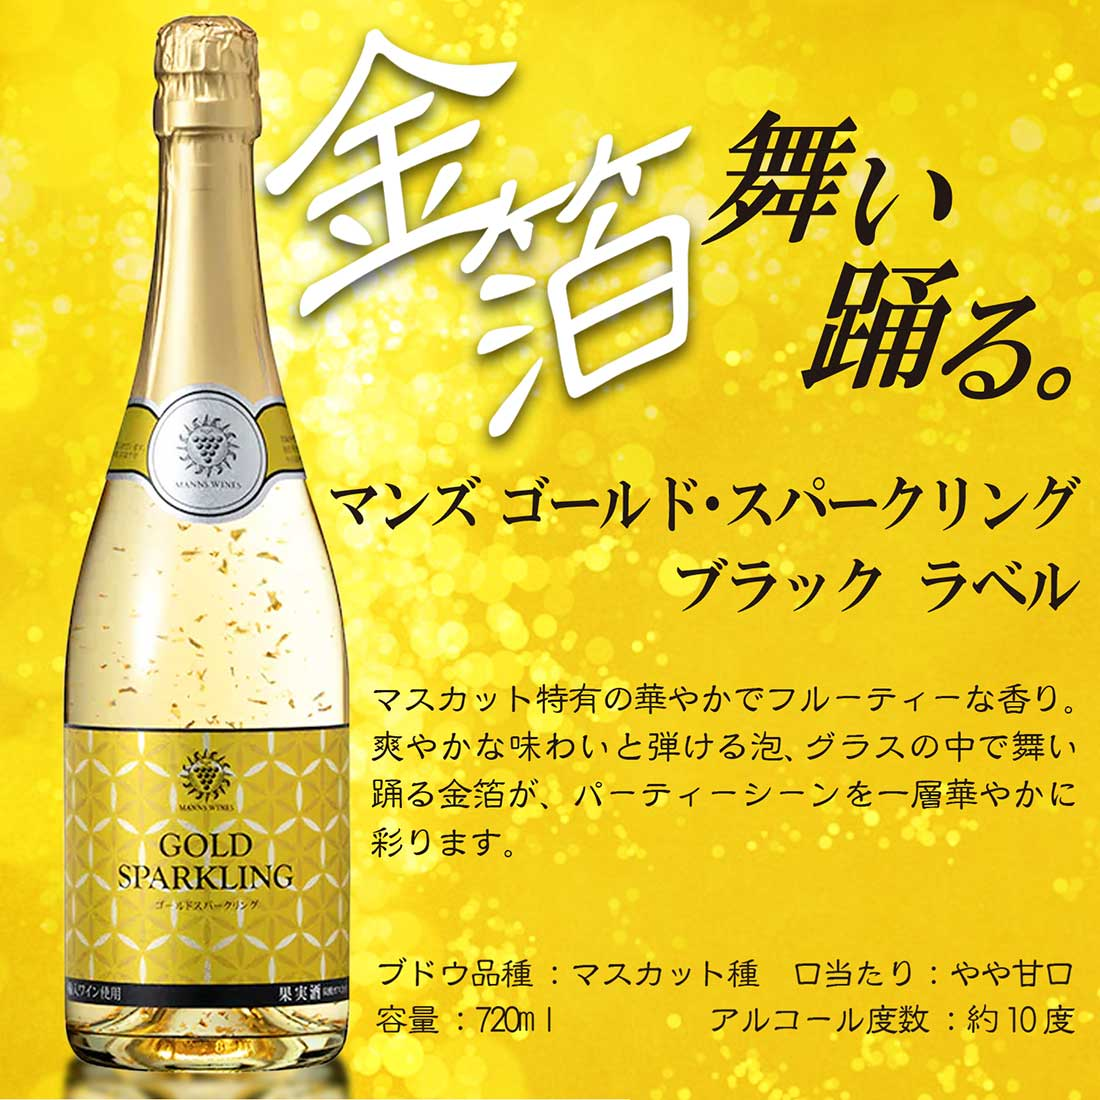 Gold-Sparkling-Kikkoman_-04-06-2021-12-19-07.jpg